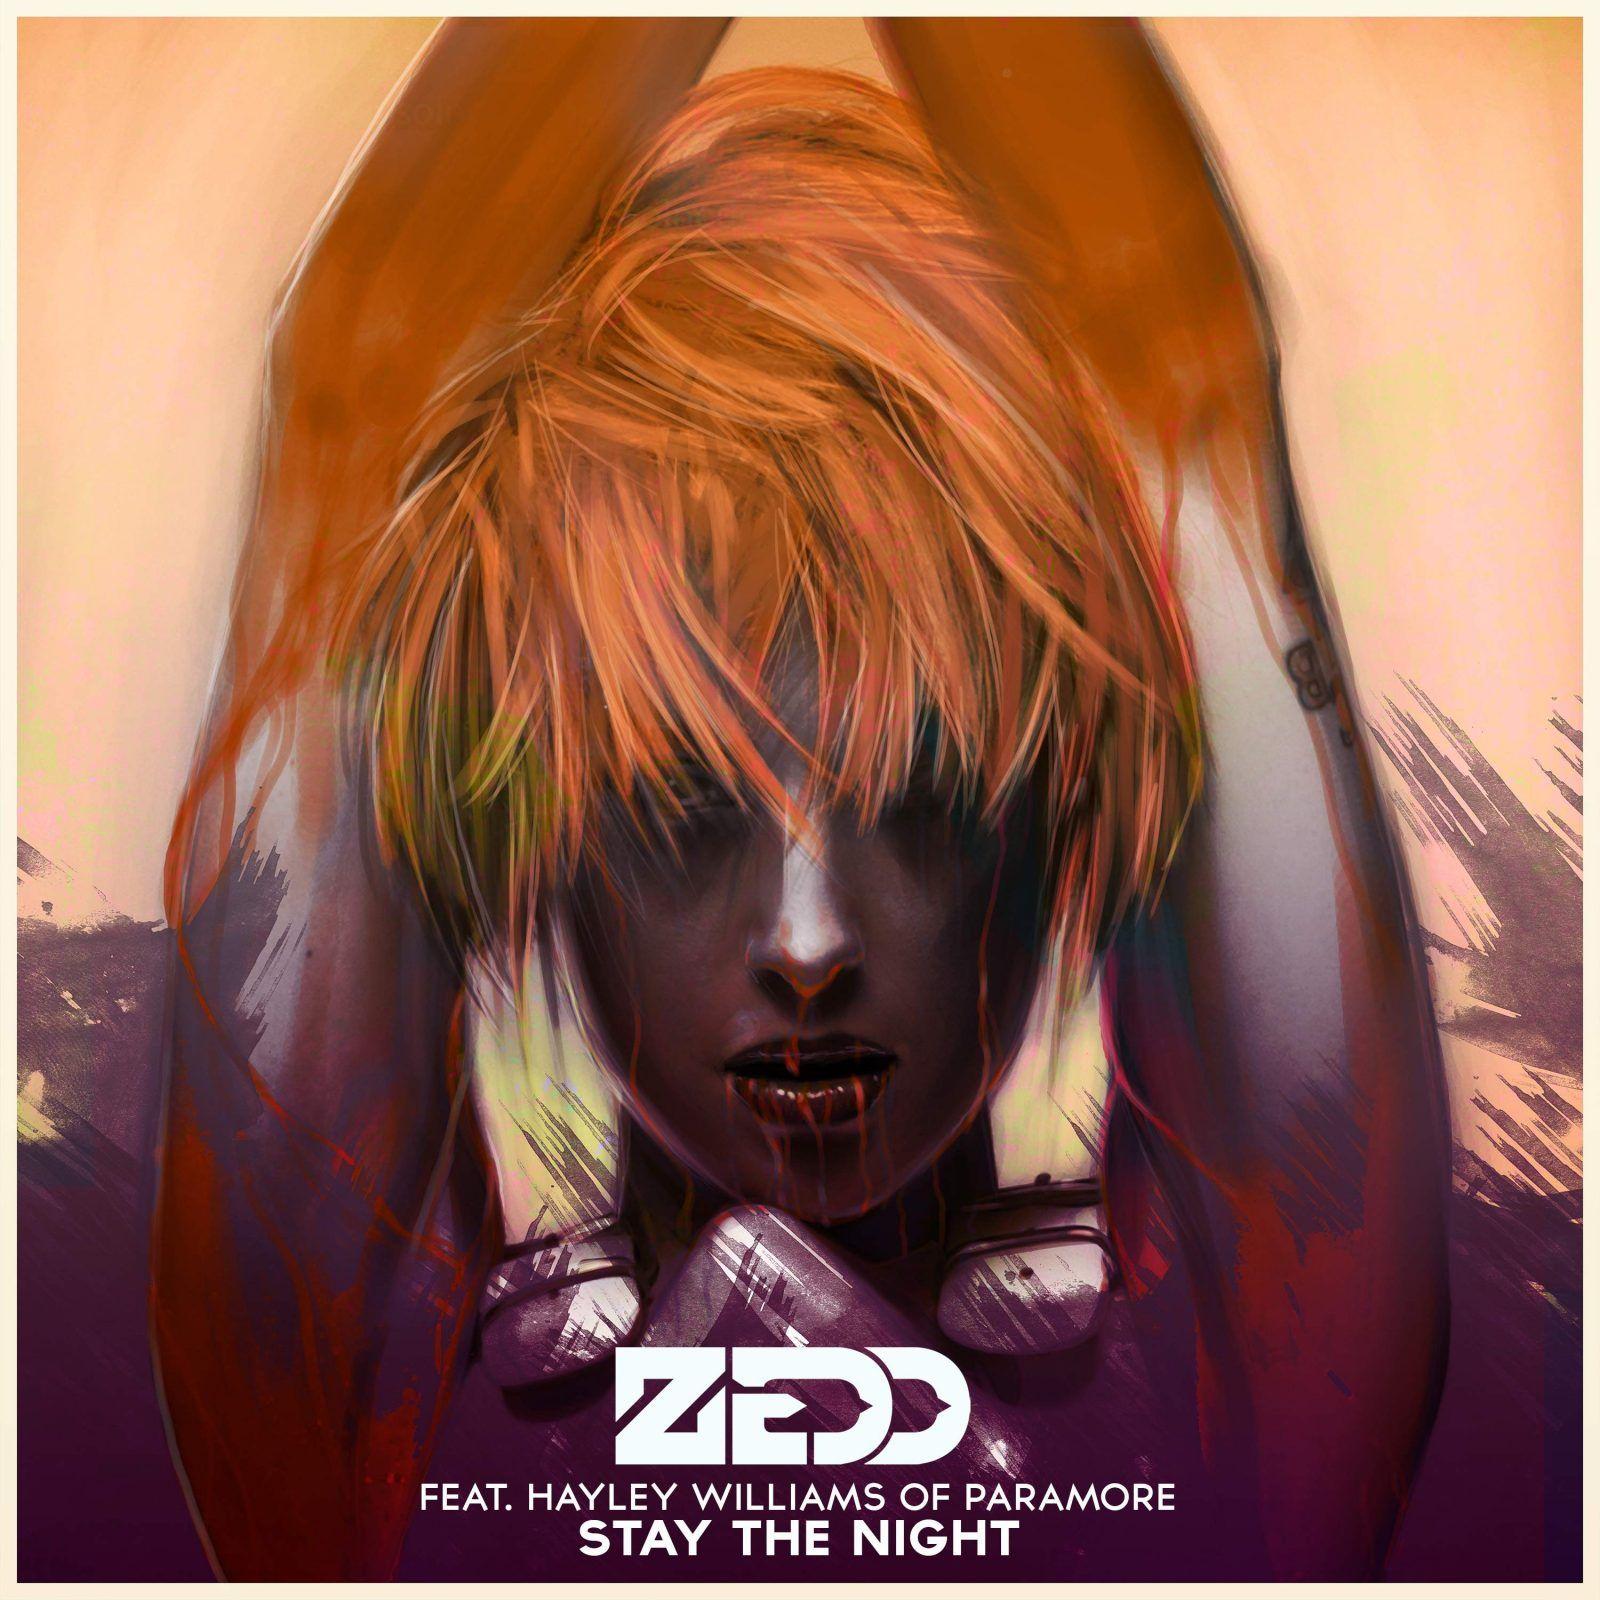 zedd-stay-night-copy.jpeg